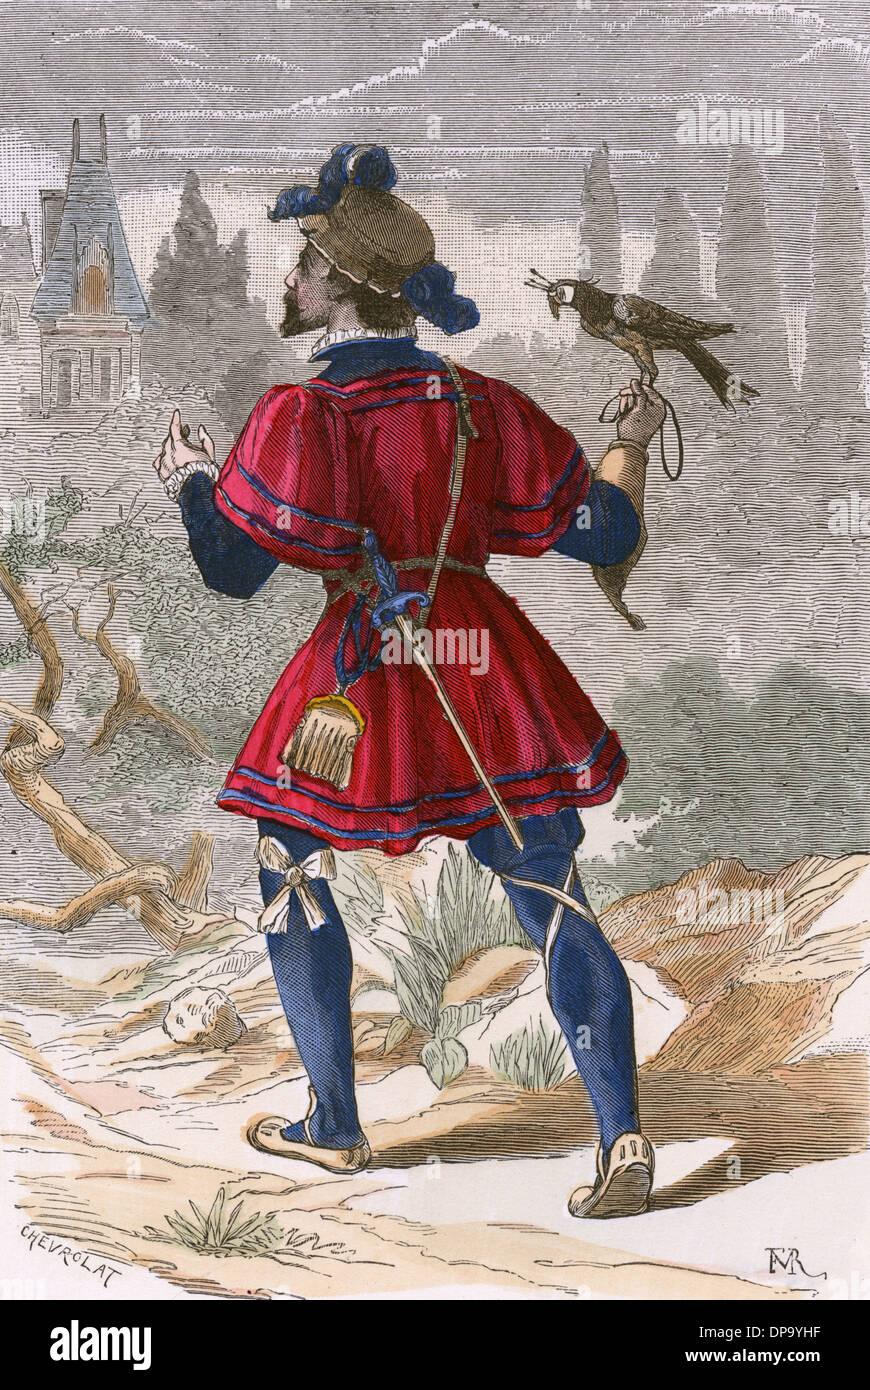 16ème siècle FALCONER Photo Stock